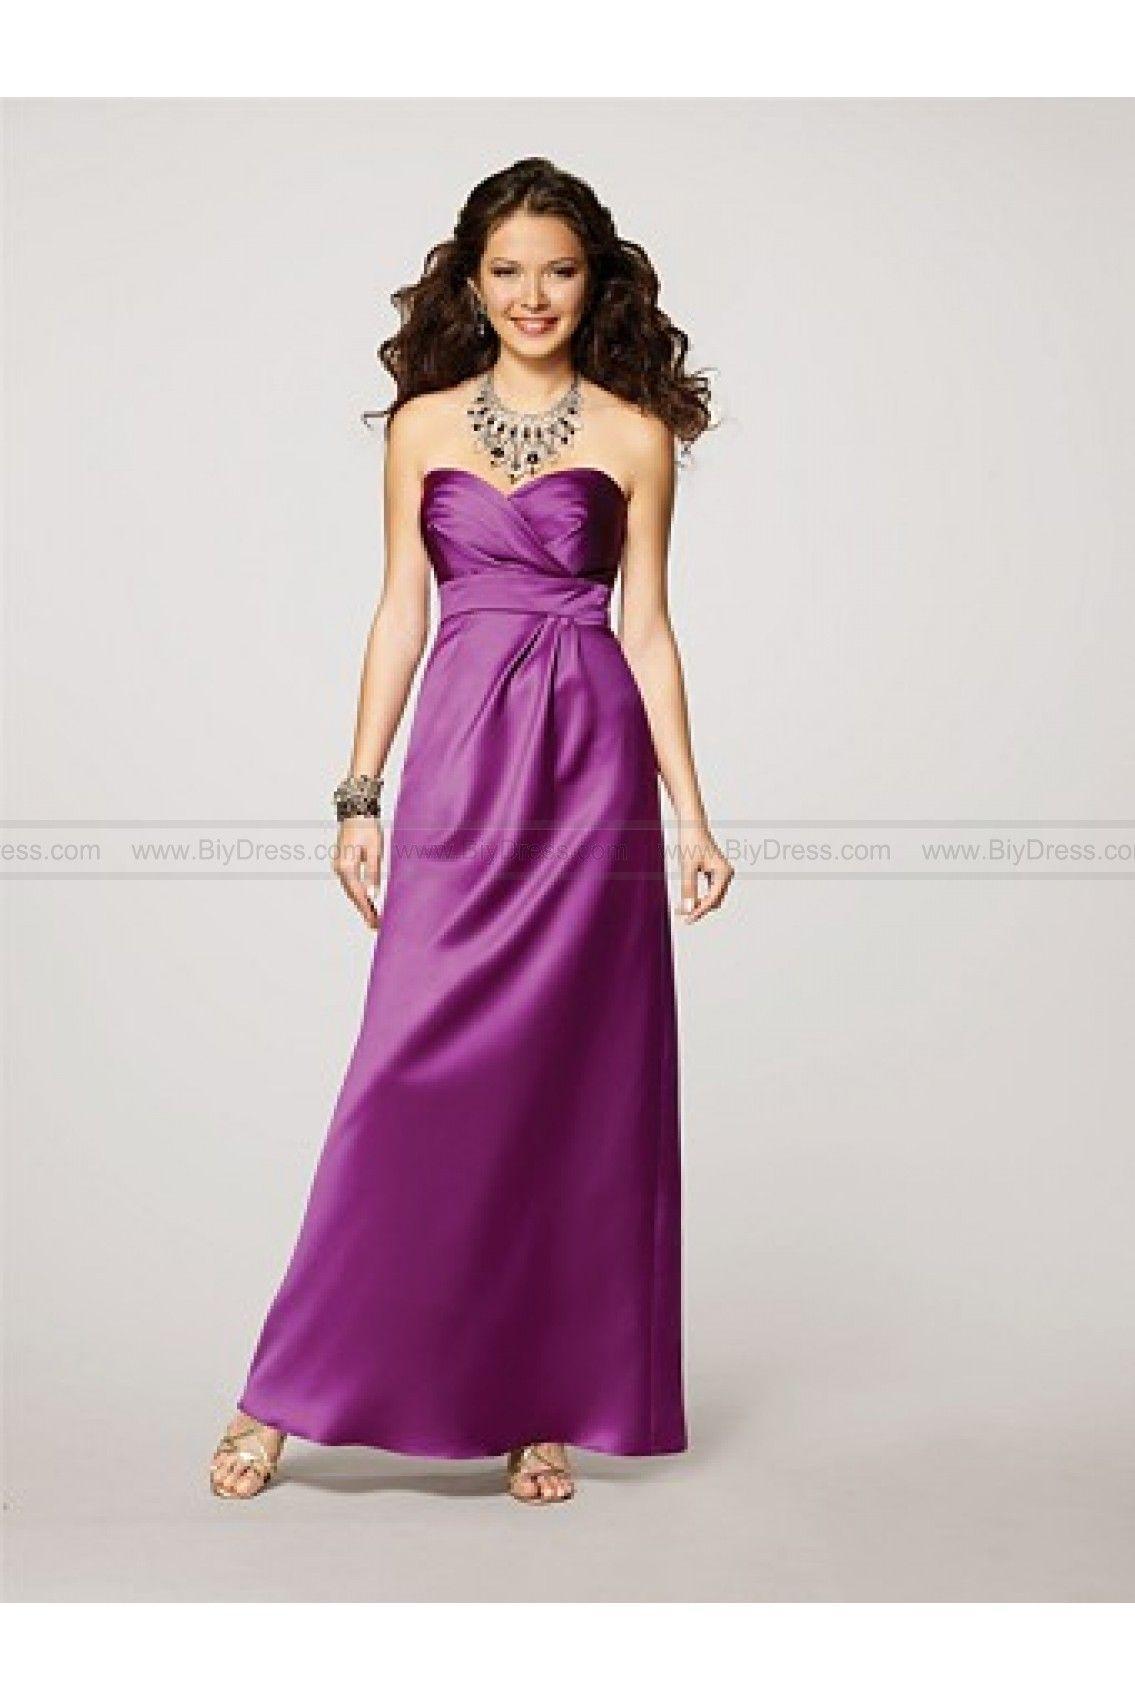 Sweetheart Satin Ruched Purple Bridesmaid Dress | Bridesmaid Dresses ...